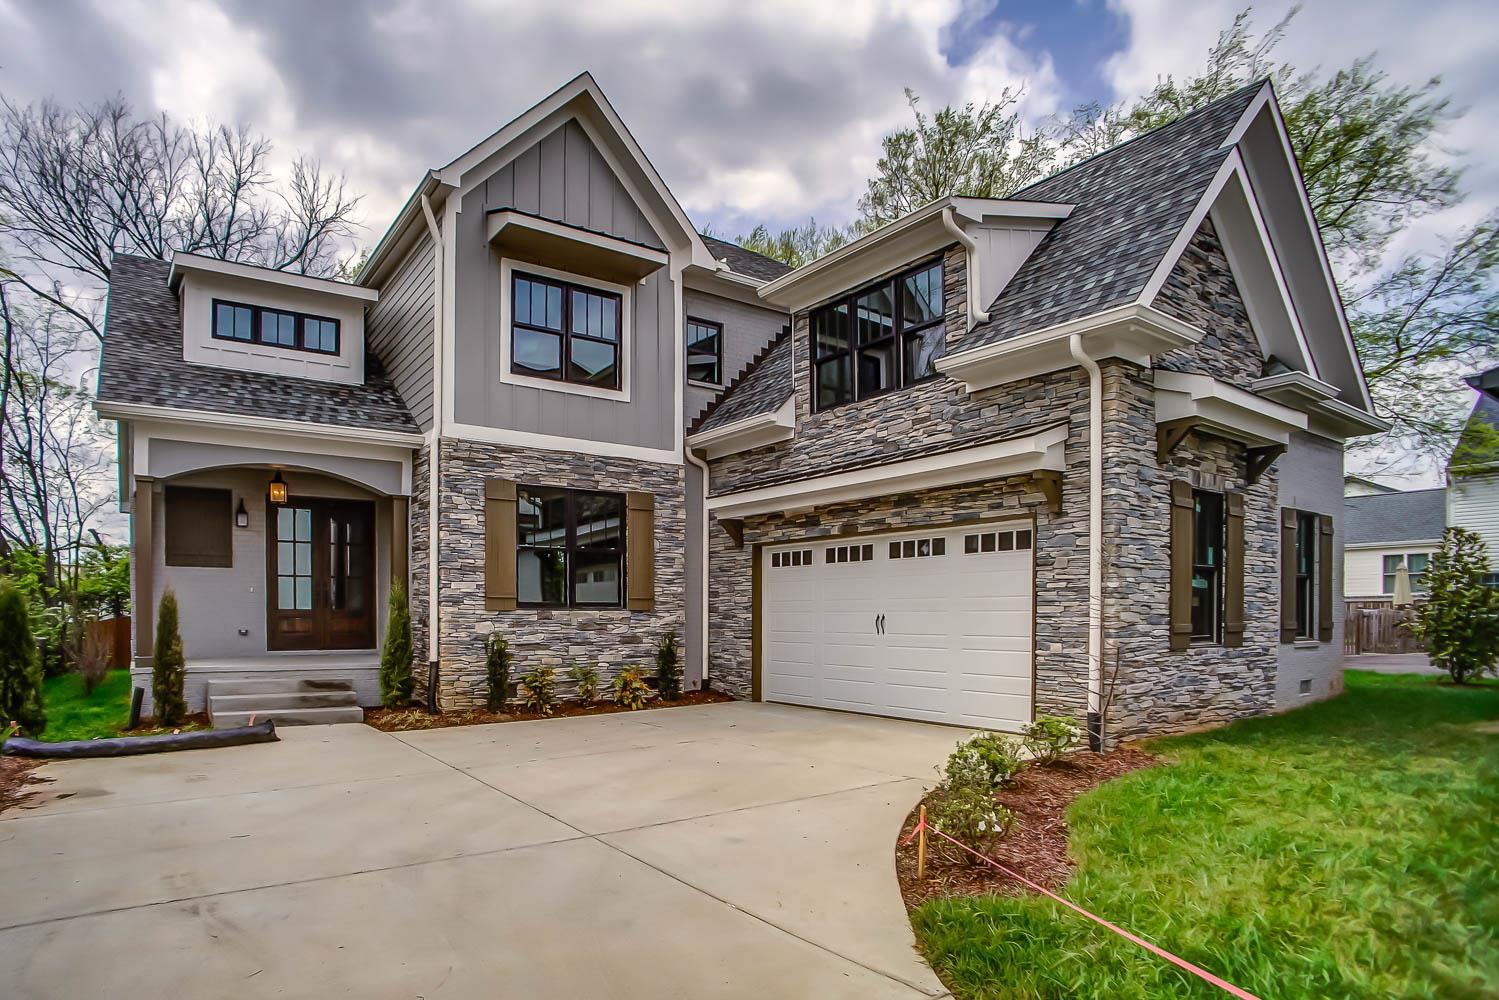 4111B Lone Oak Rd, Nashville - Green Hills, Tennessee